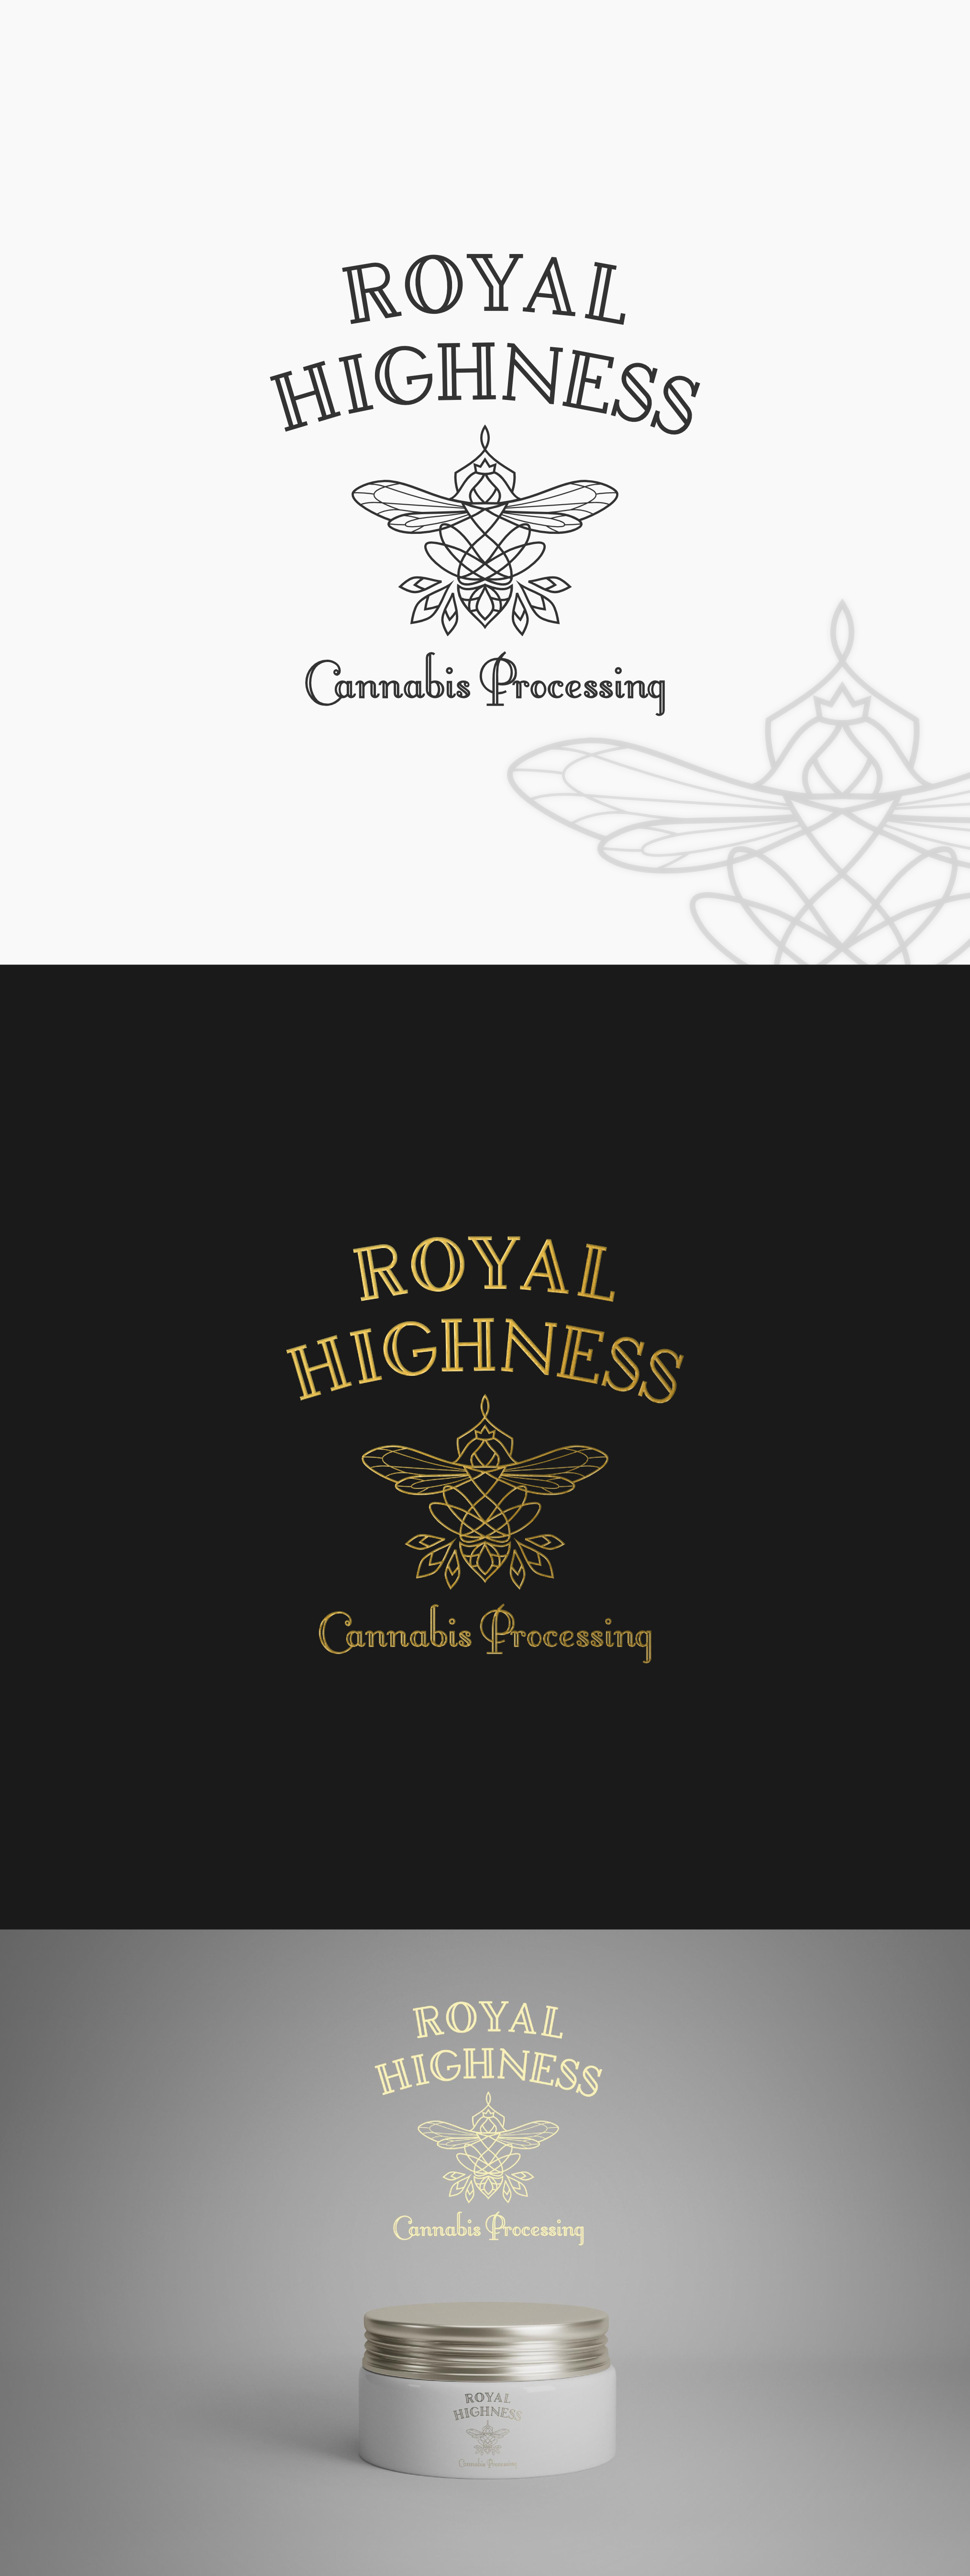 Royal Highness Cannabis Processing Logo